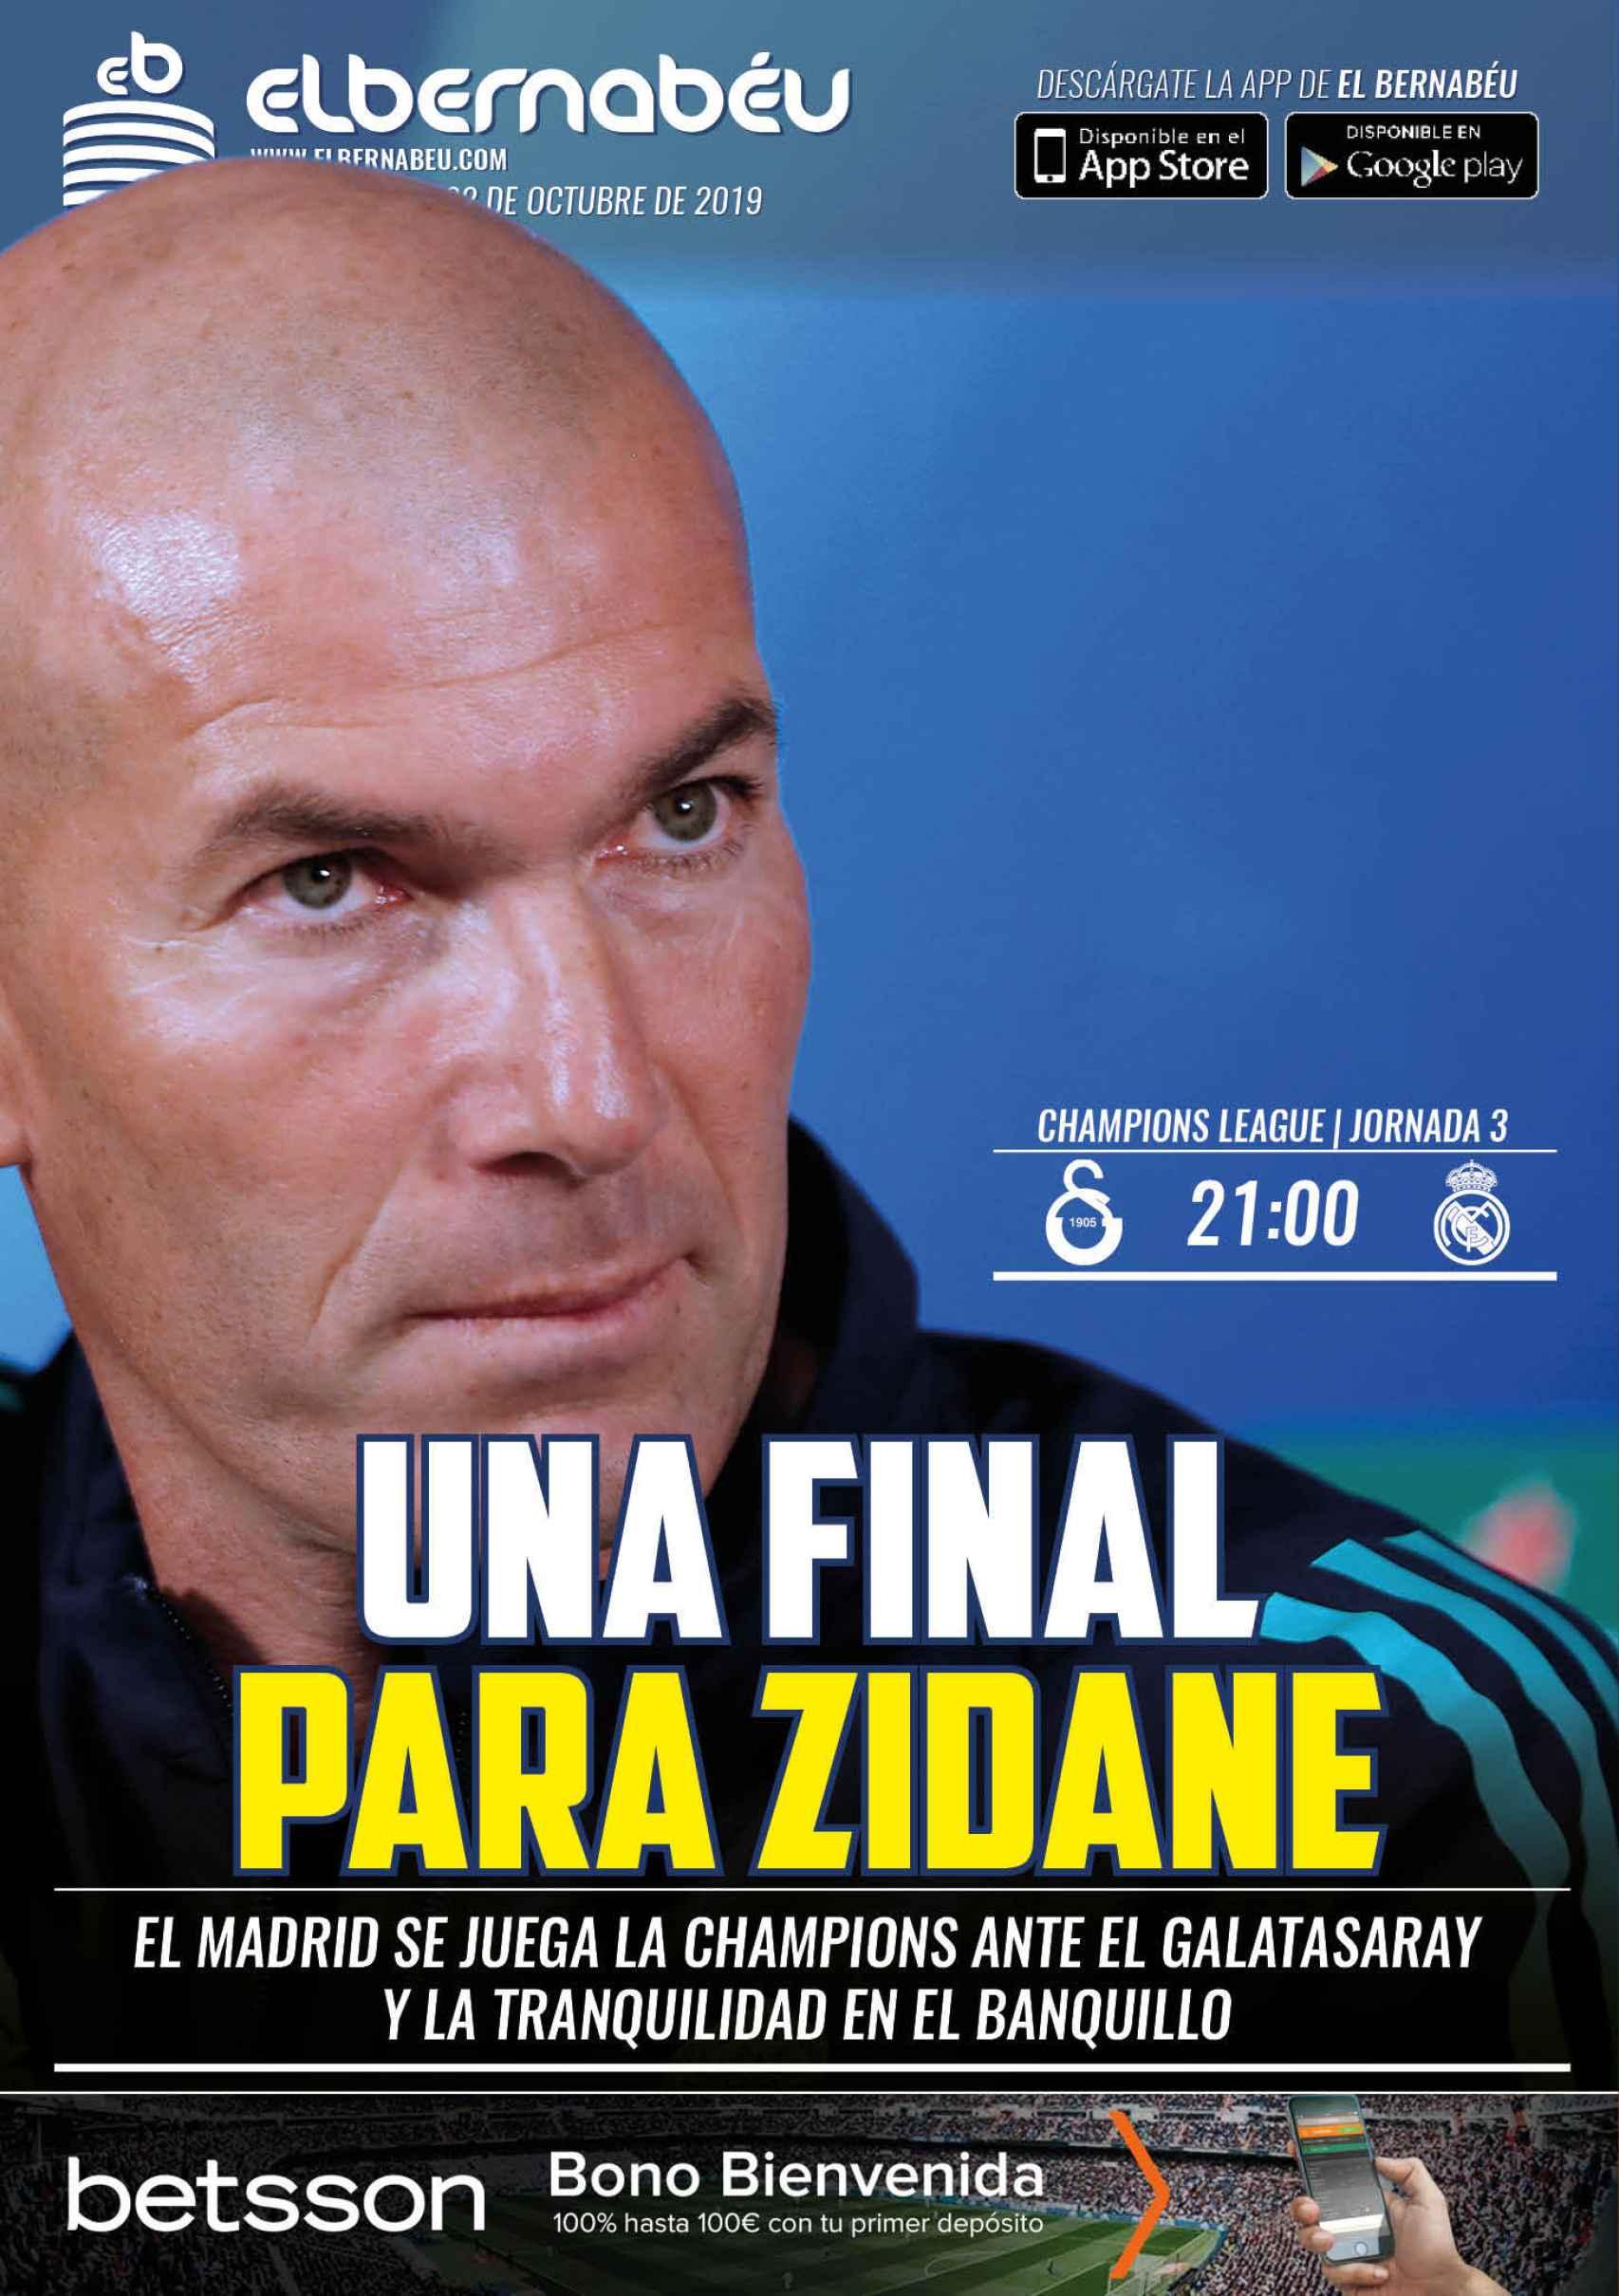 La portada de El Bernabéu (22/10/2019)